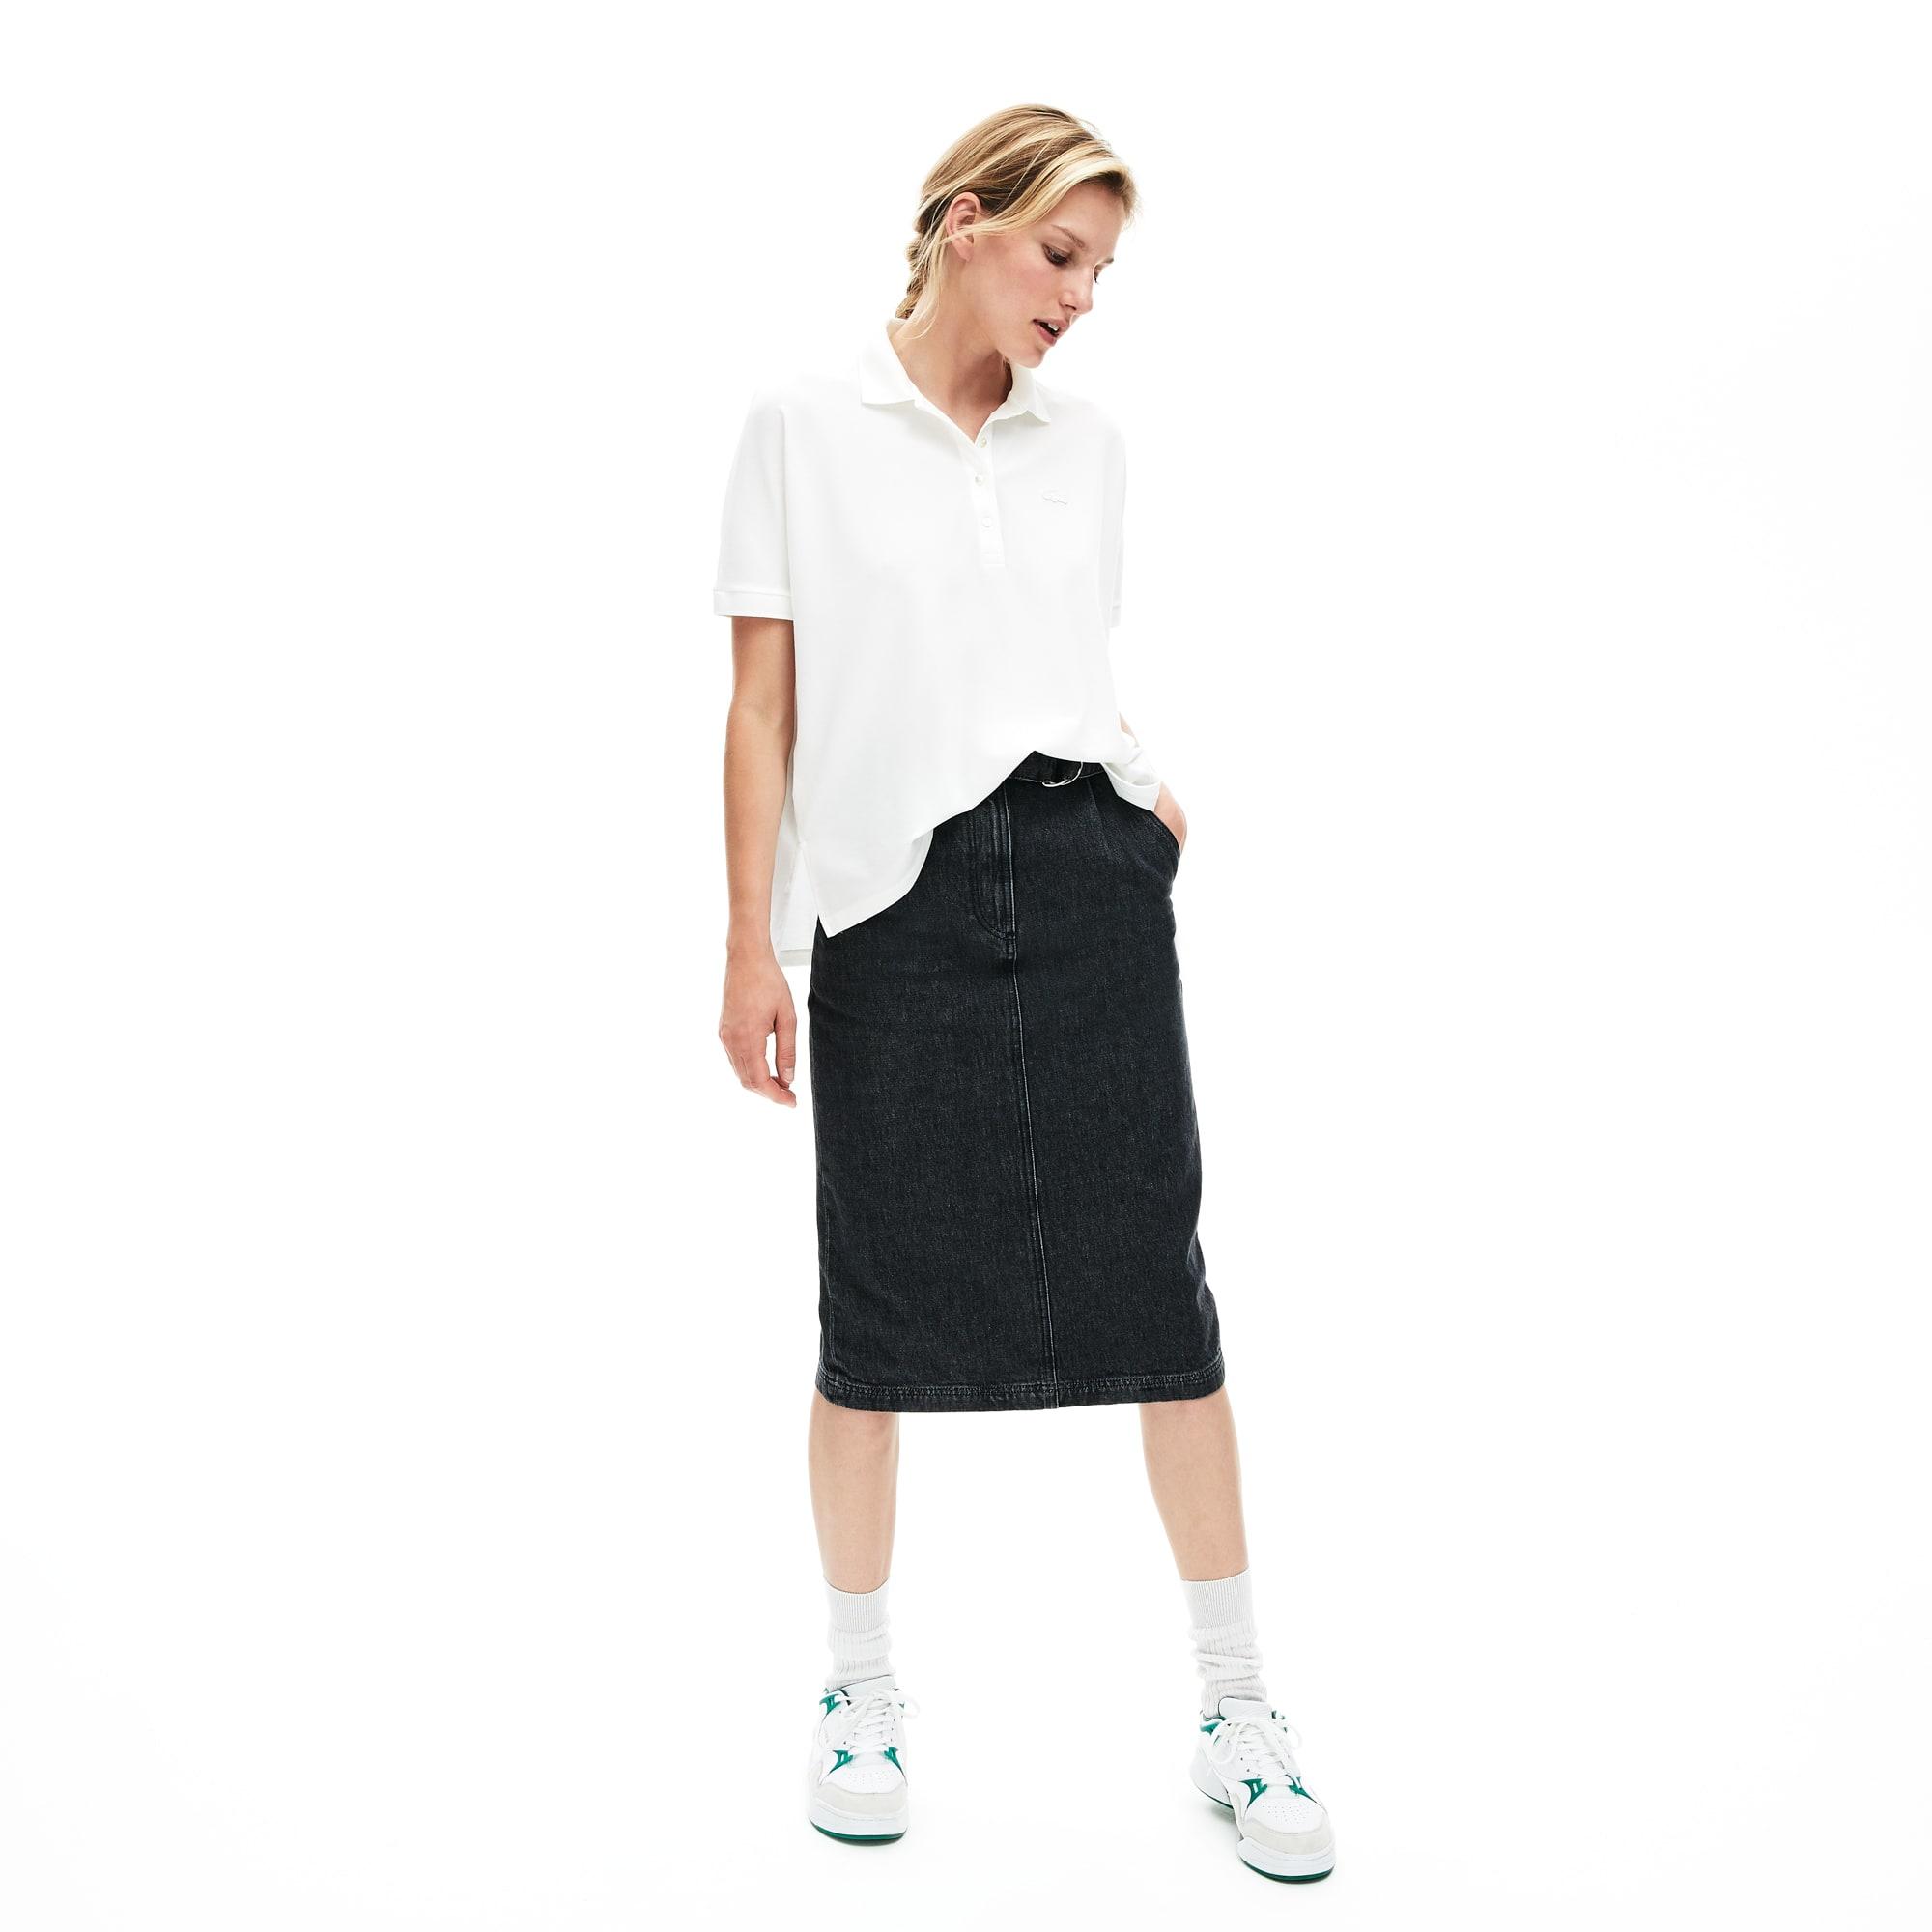 196000b5e0fa3 Women s Modern Fit Flowing Stretch Cotton Piqué Polo